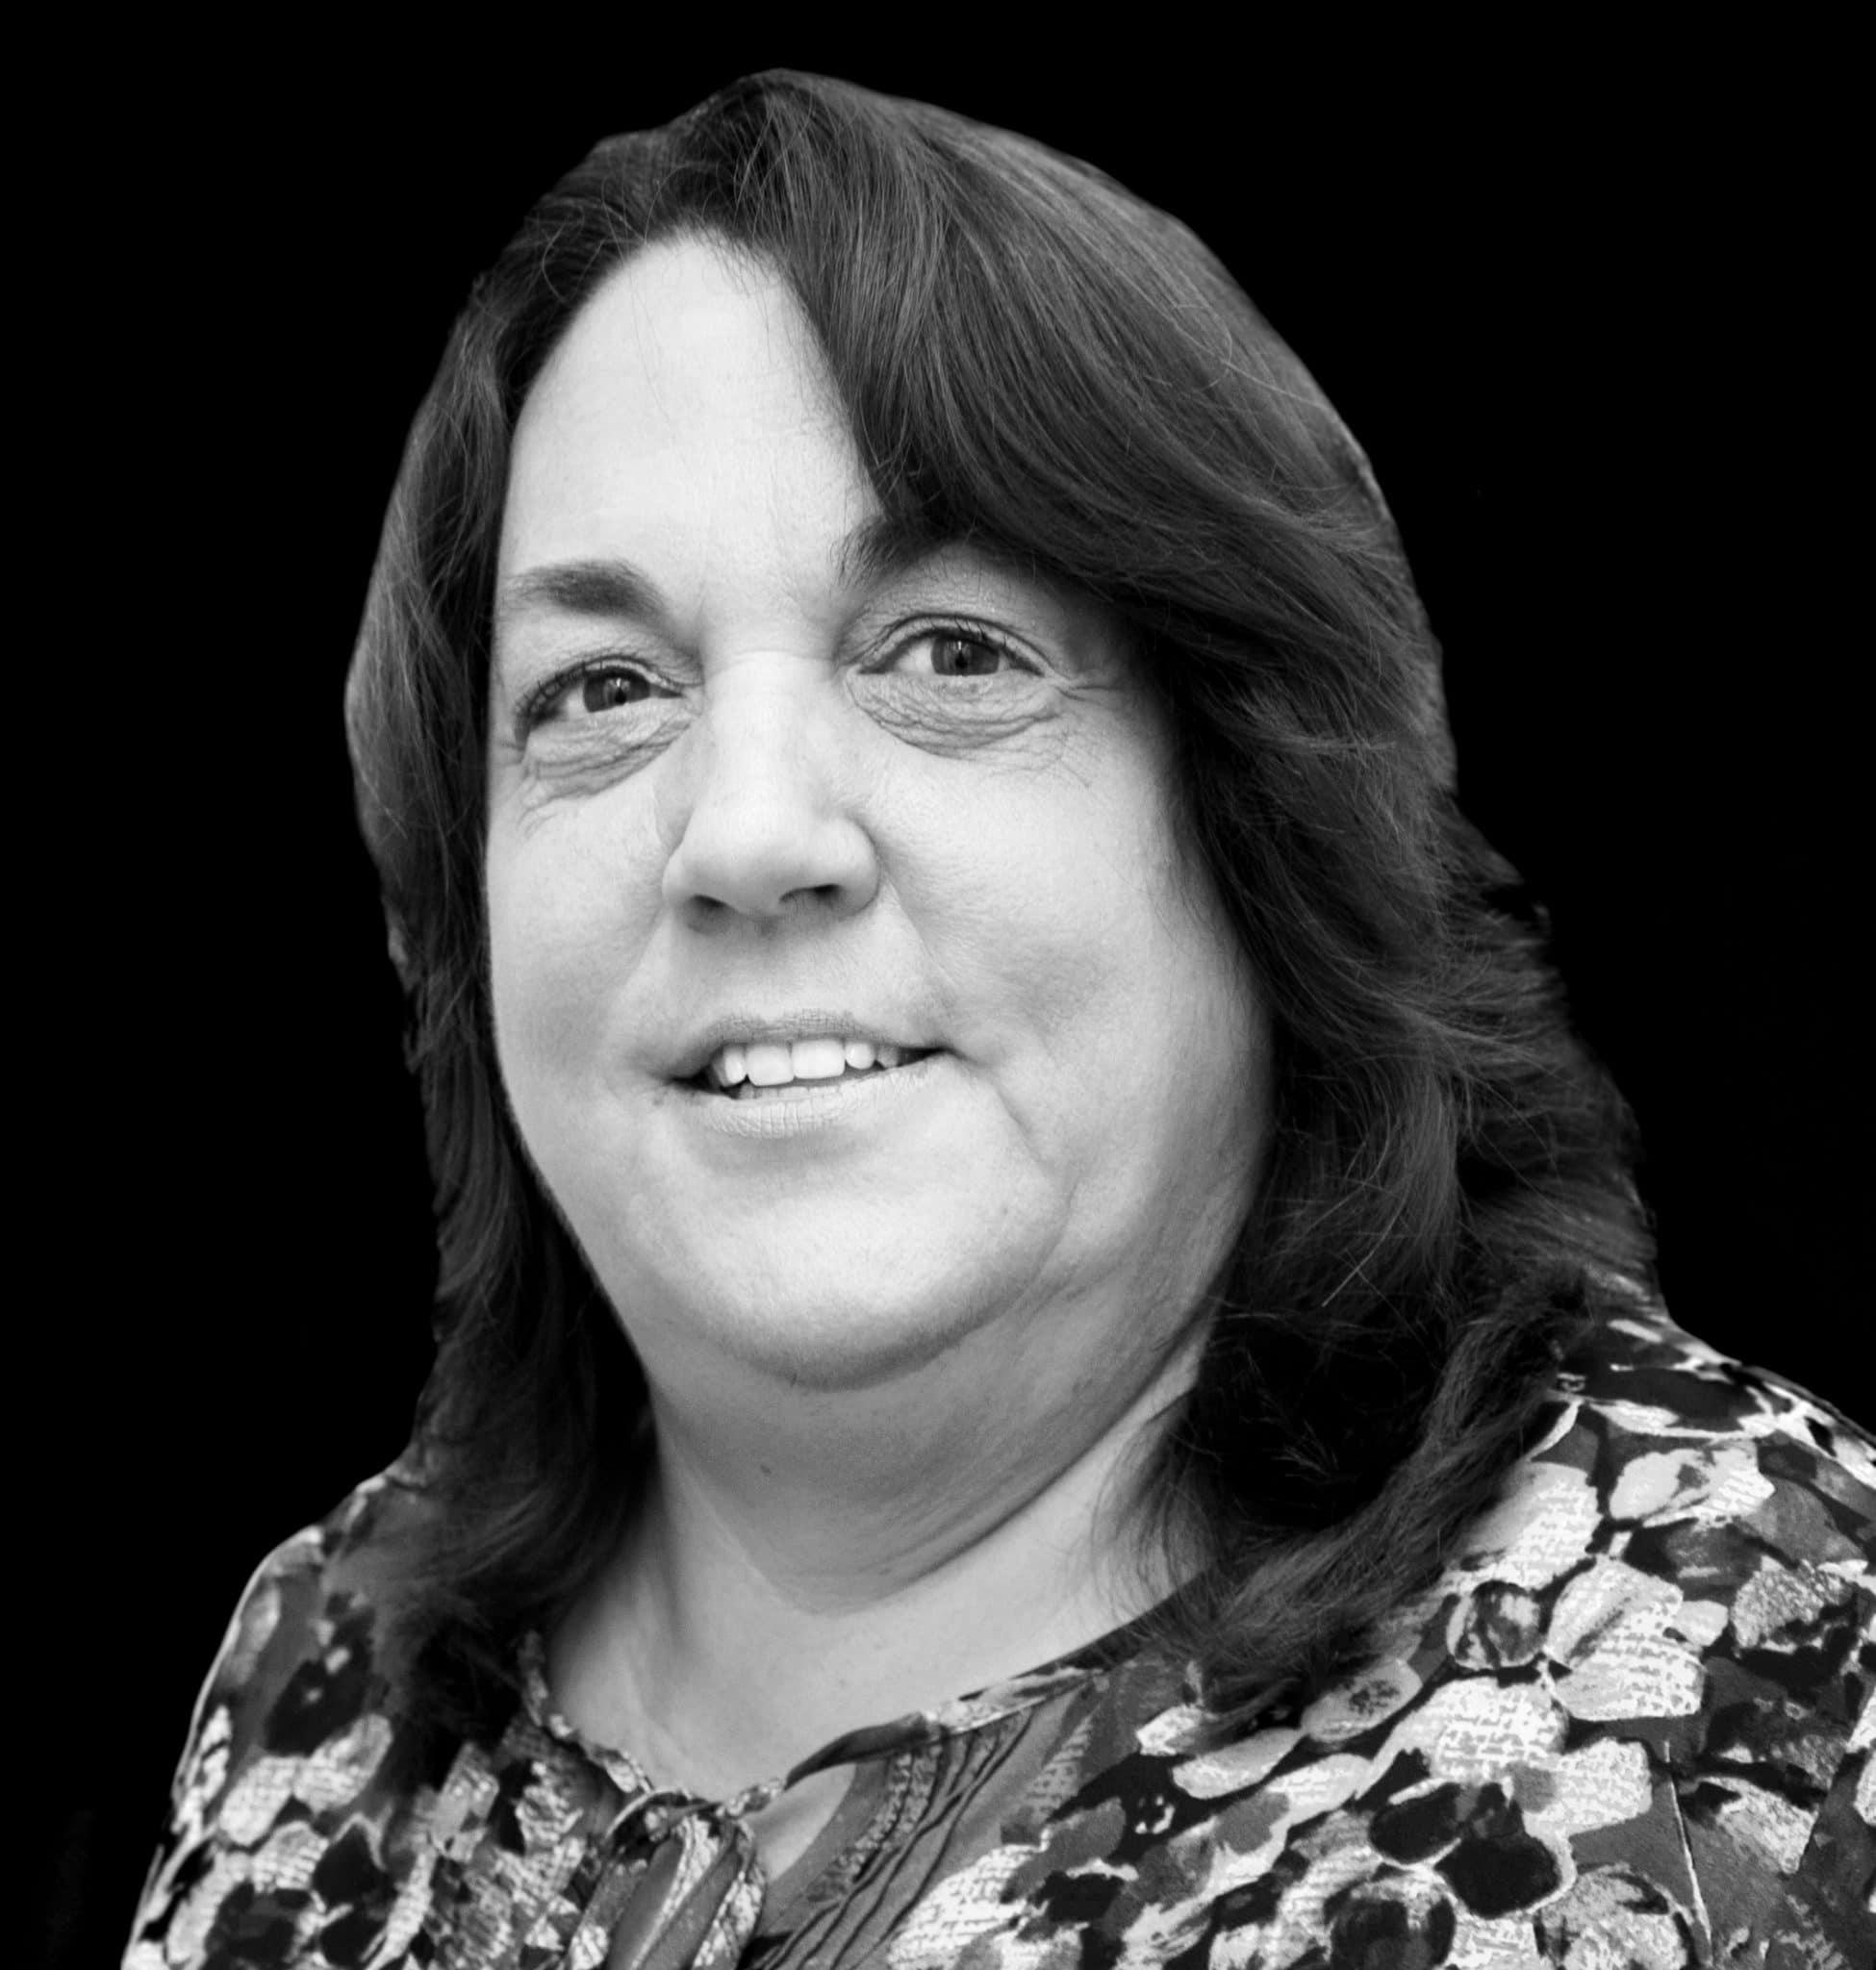 Sharon Toledo